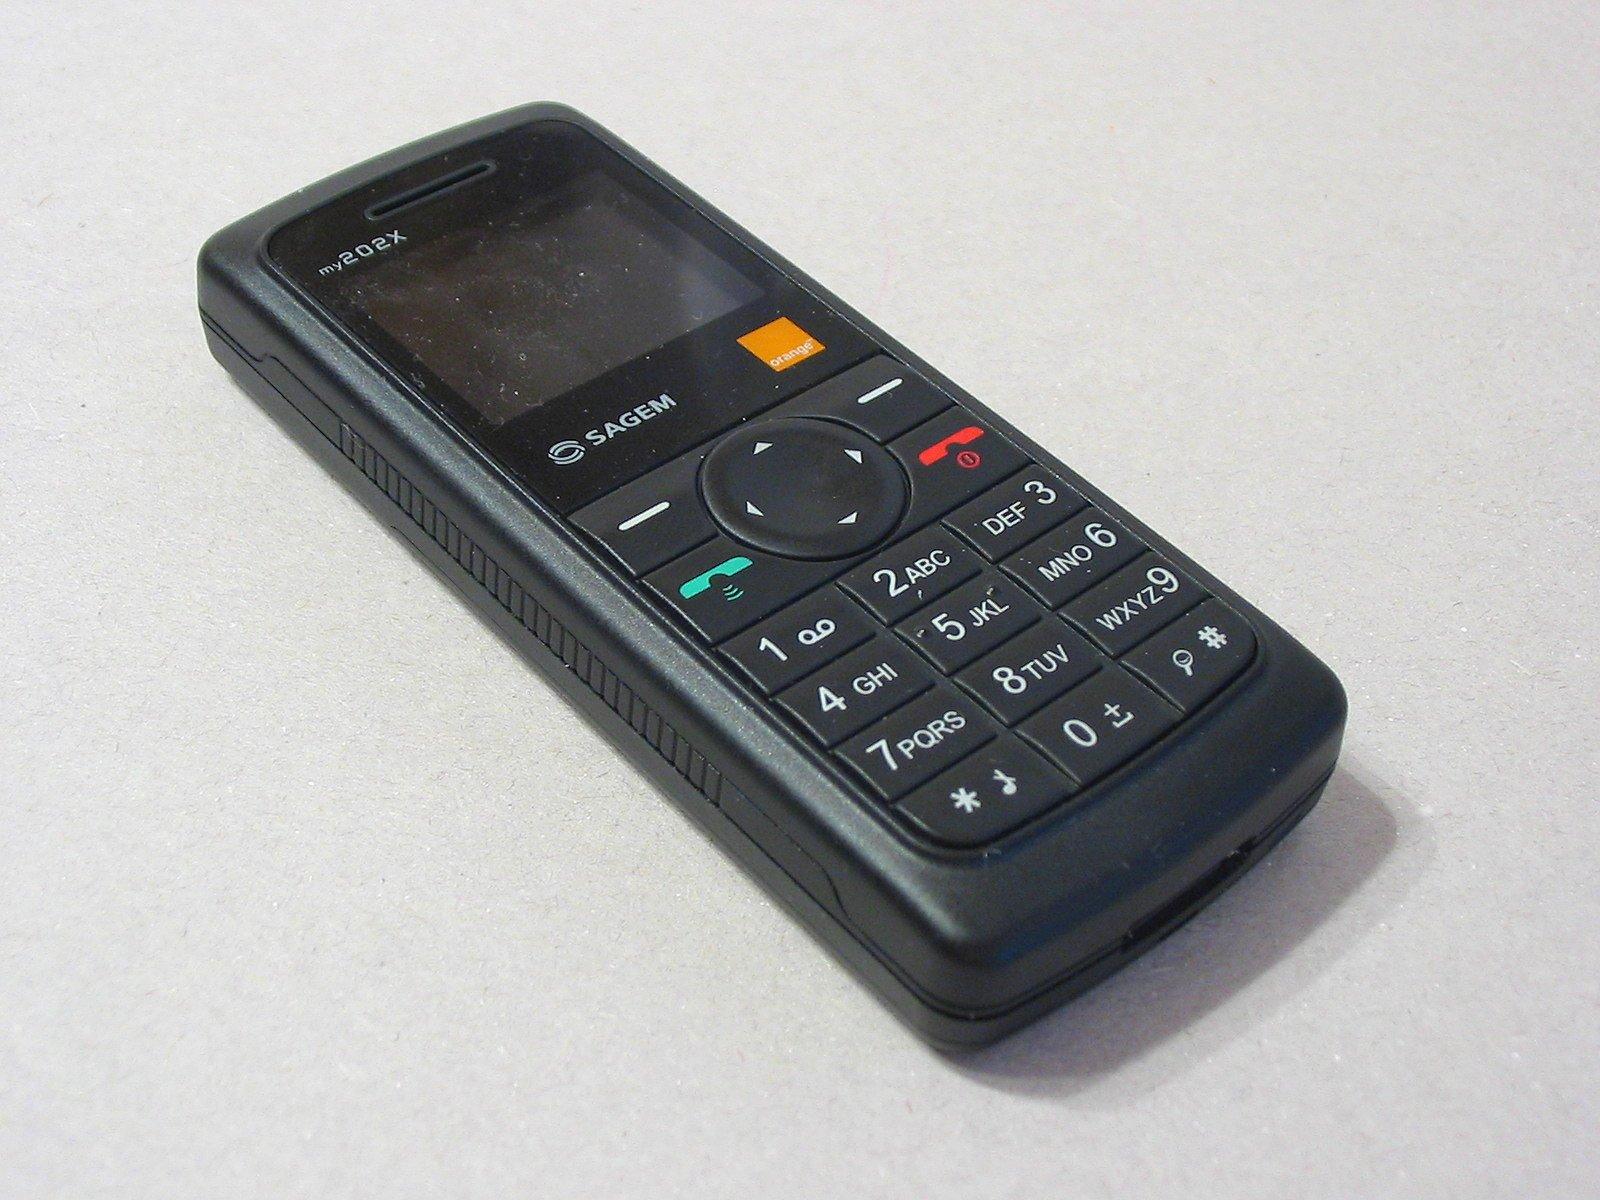 Cell_phone_Sagem_my202X_ubt